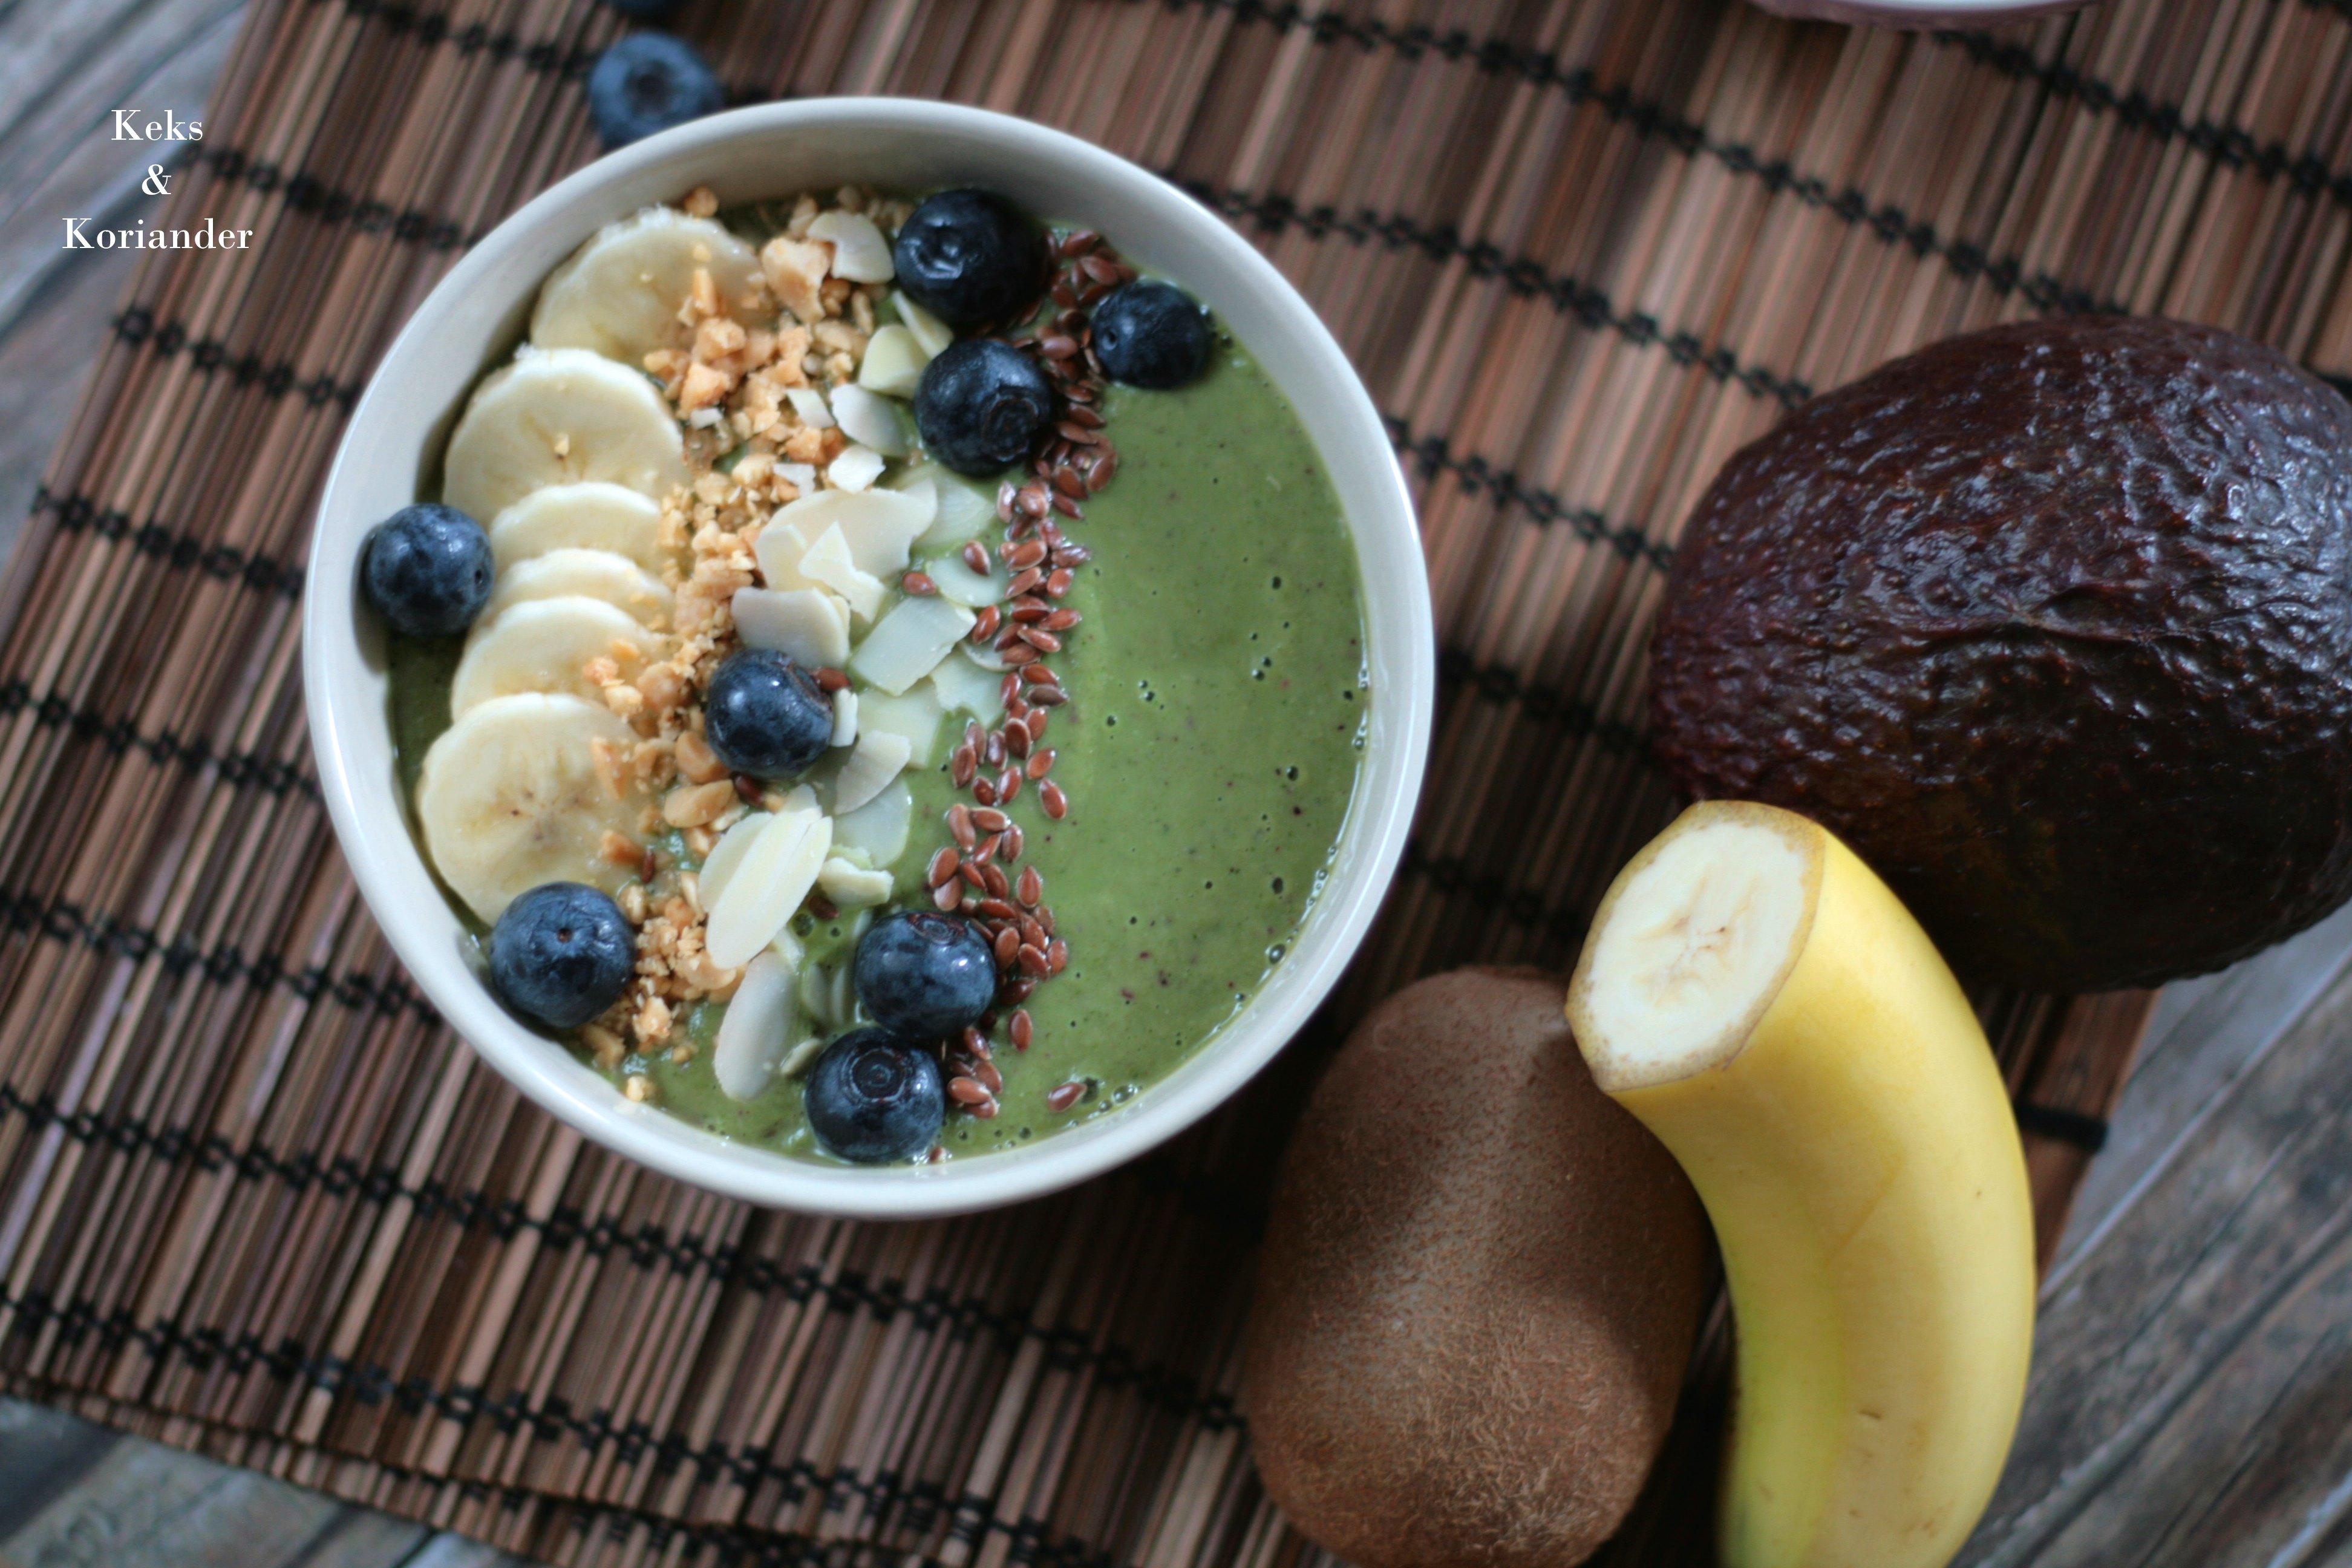 Smoothie Bowl Green Smoothie Avocado Beeren Spinat Nüsse Banane 2